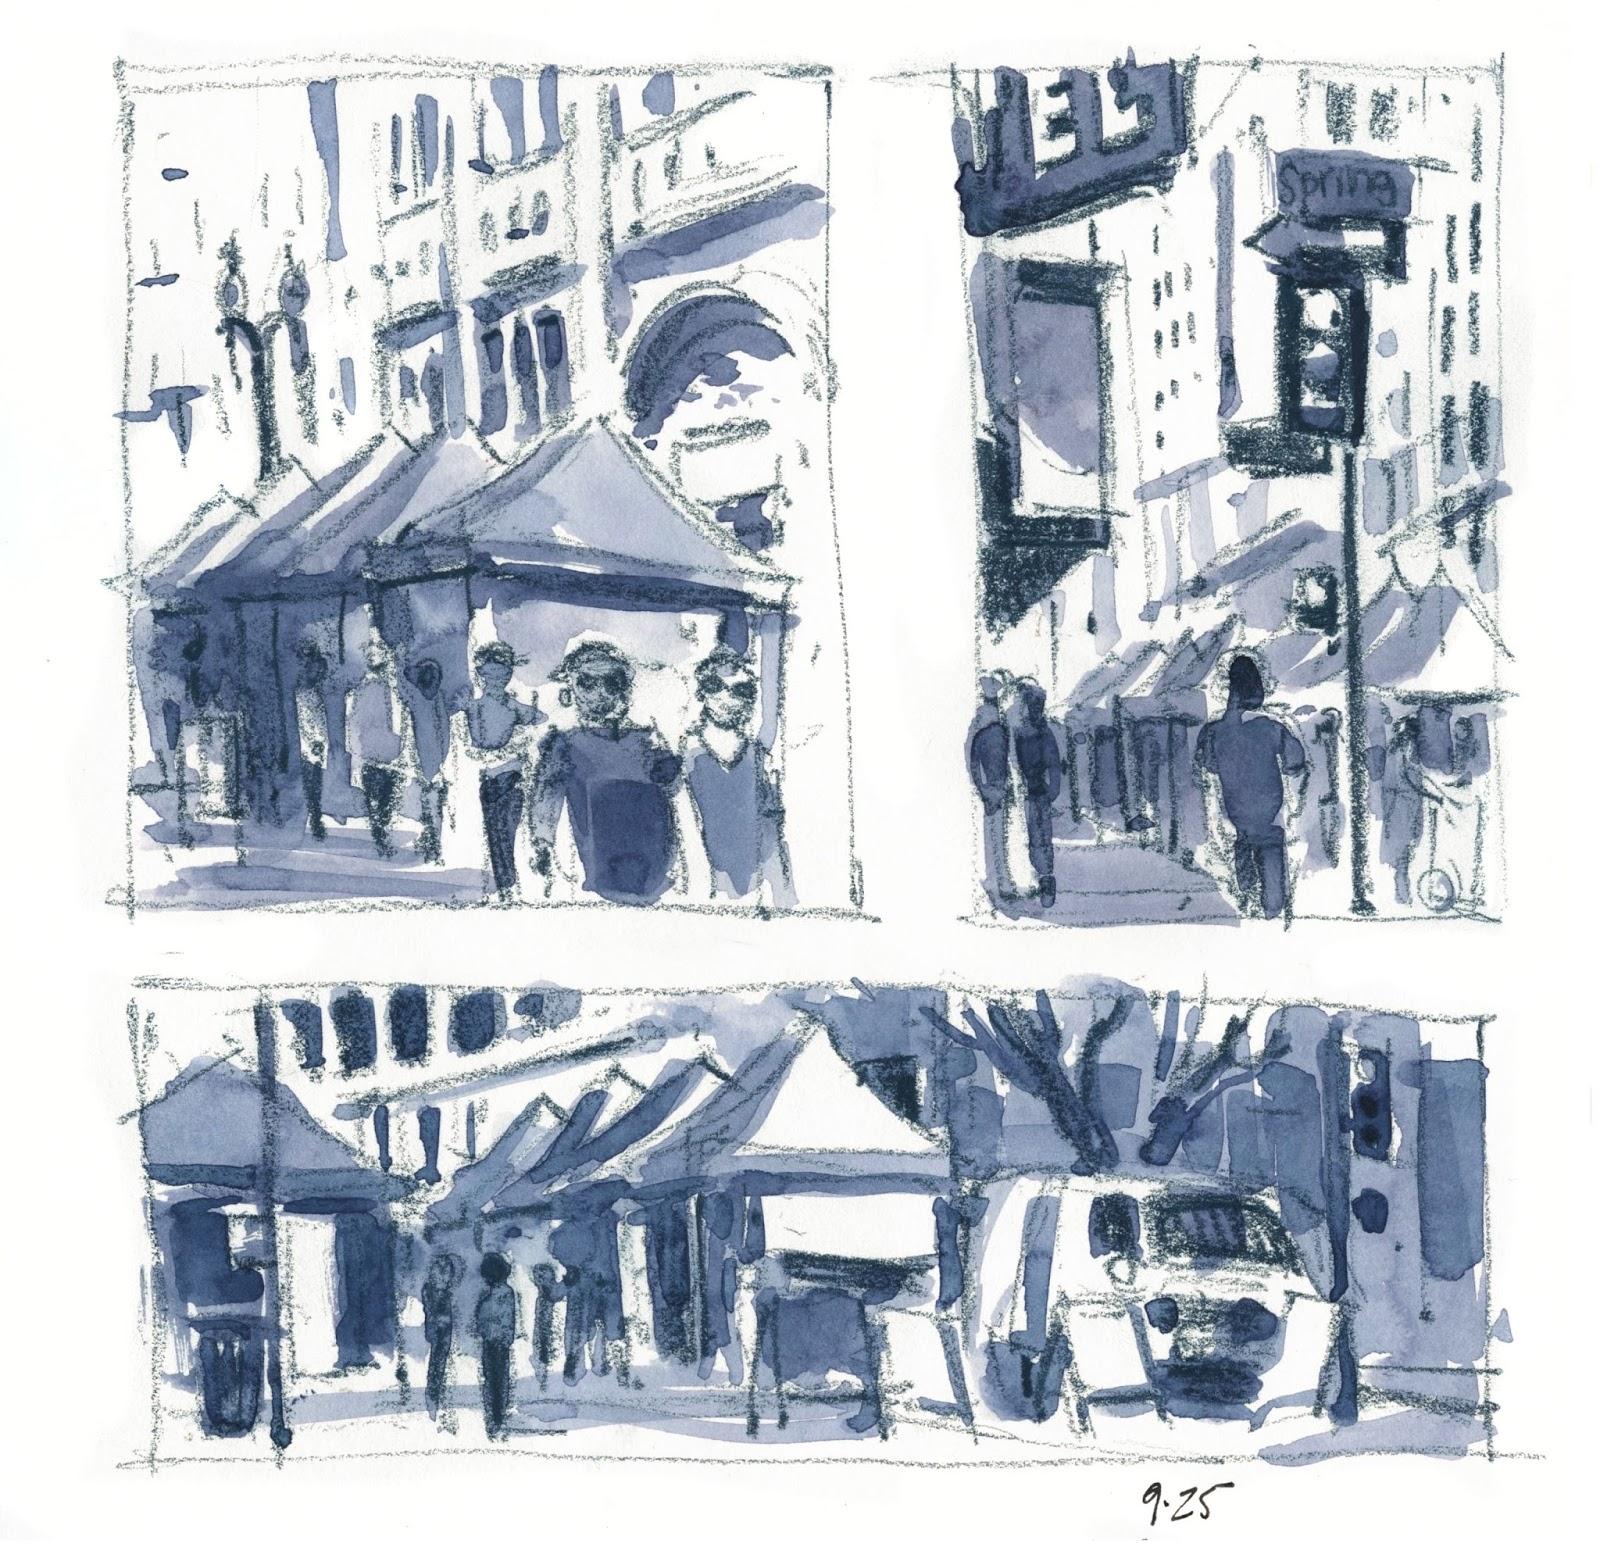 Sketching in Los Angeles...the LA Plein Air Festival | Urban Sketchers